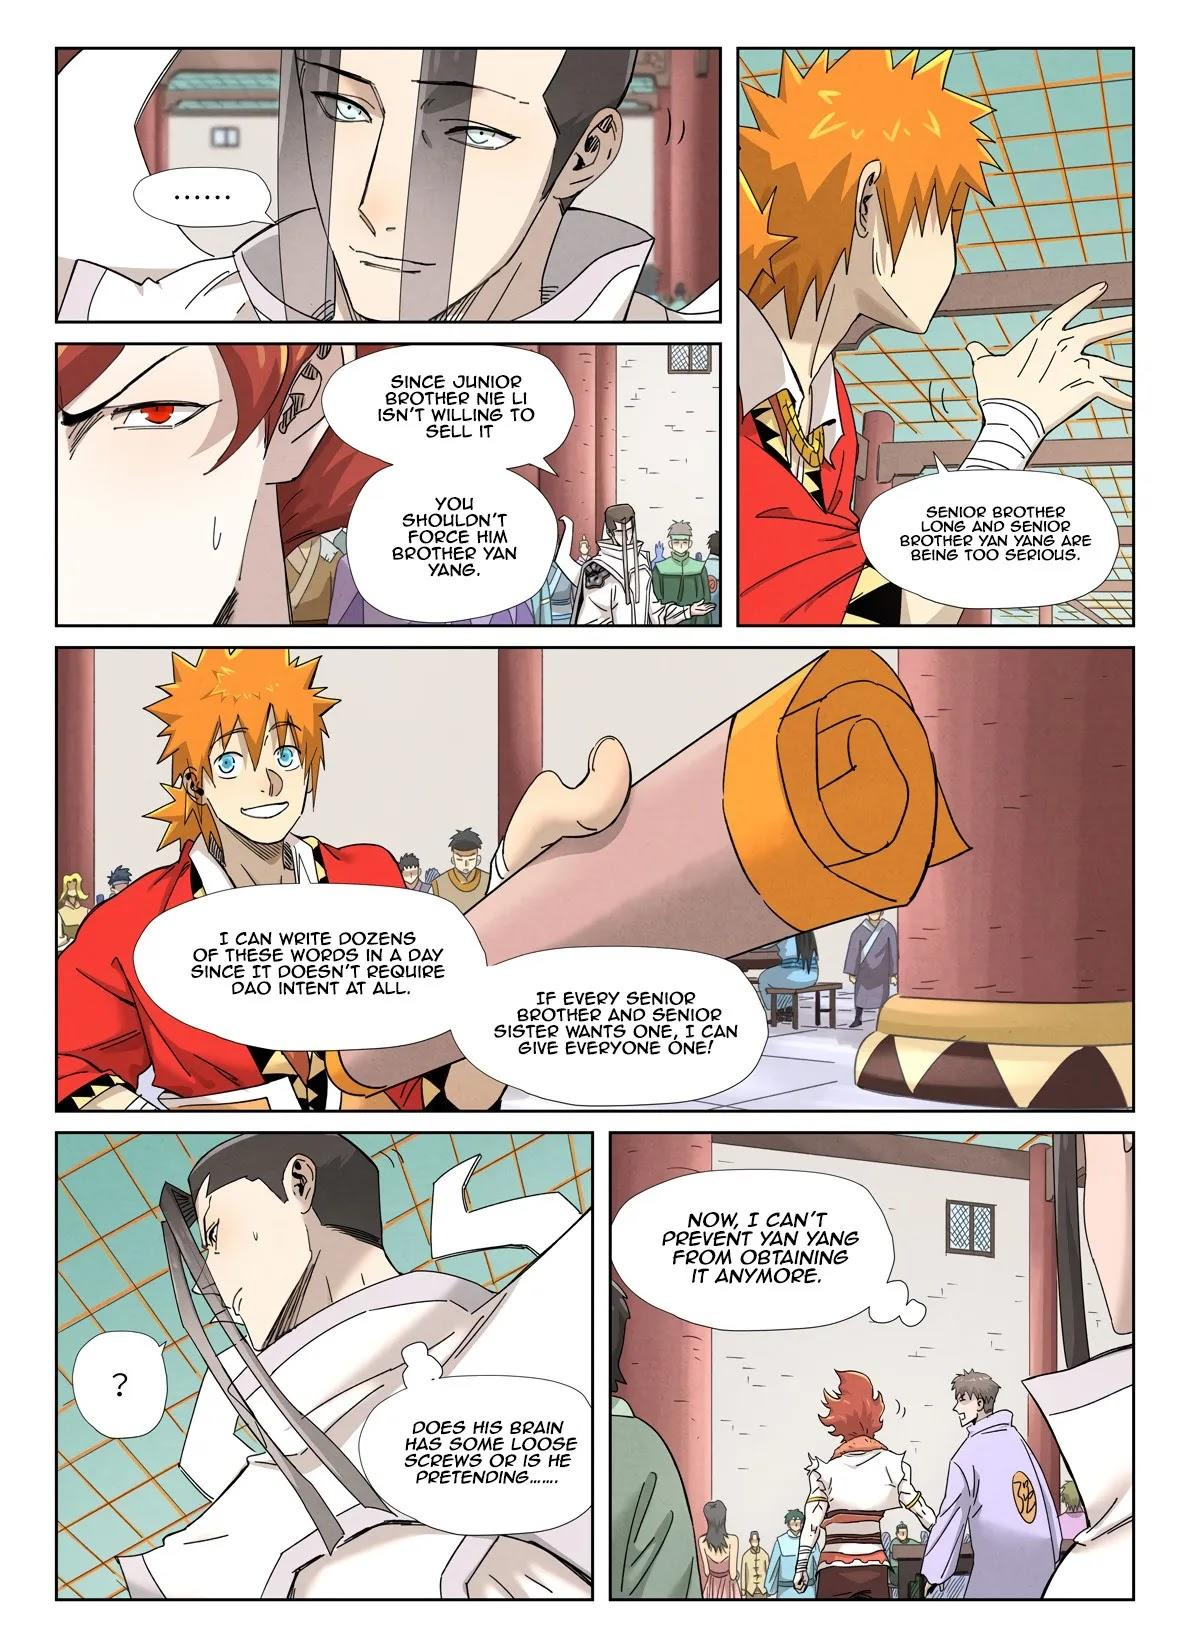 Tales Of Demons And Gods Chapter 342.1 page 5 - Mangakakalot